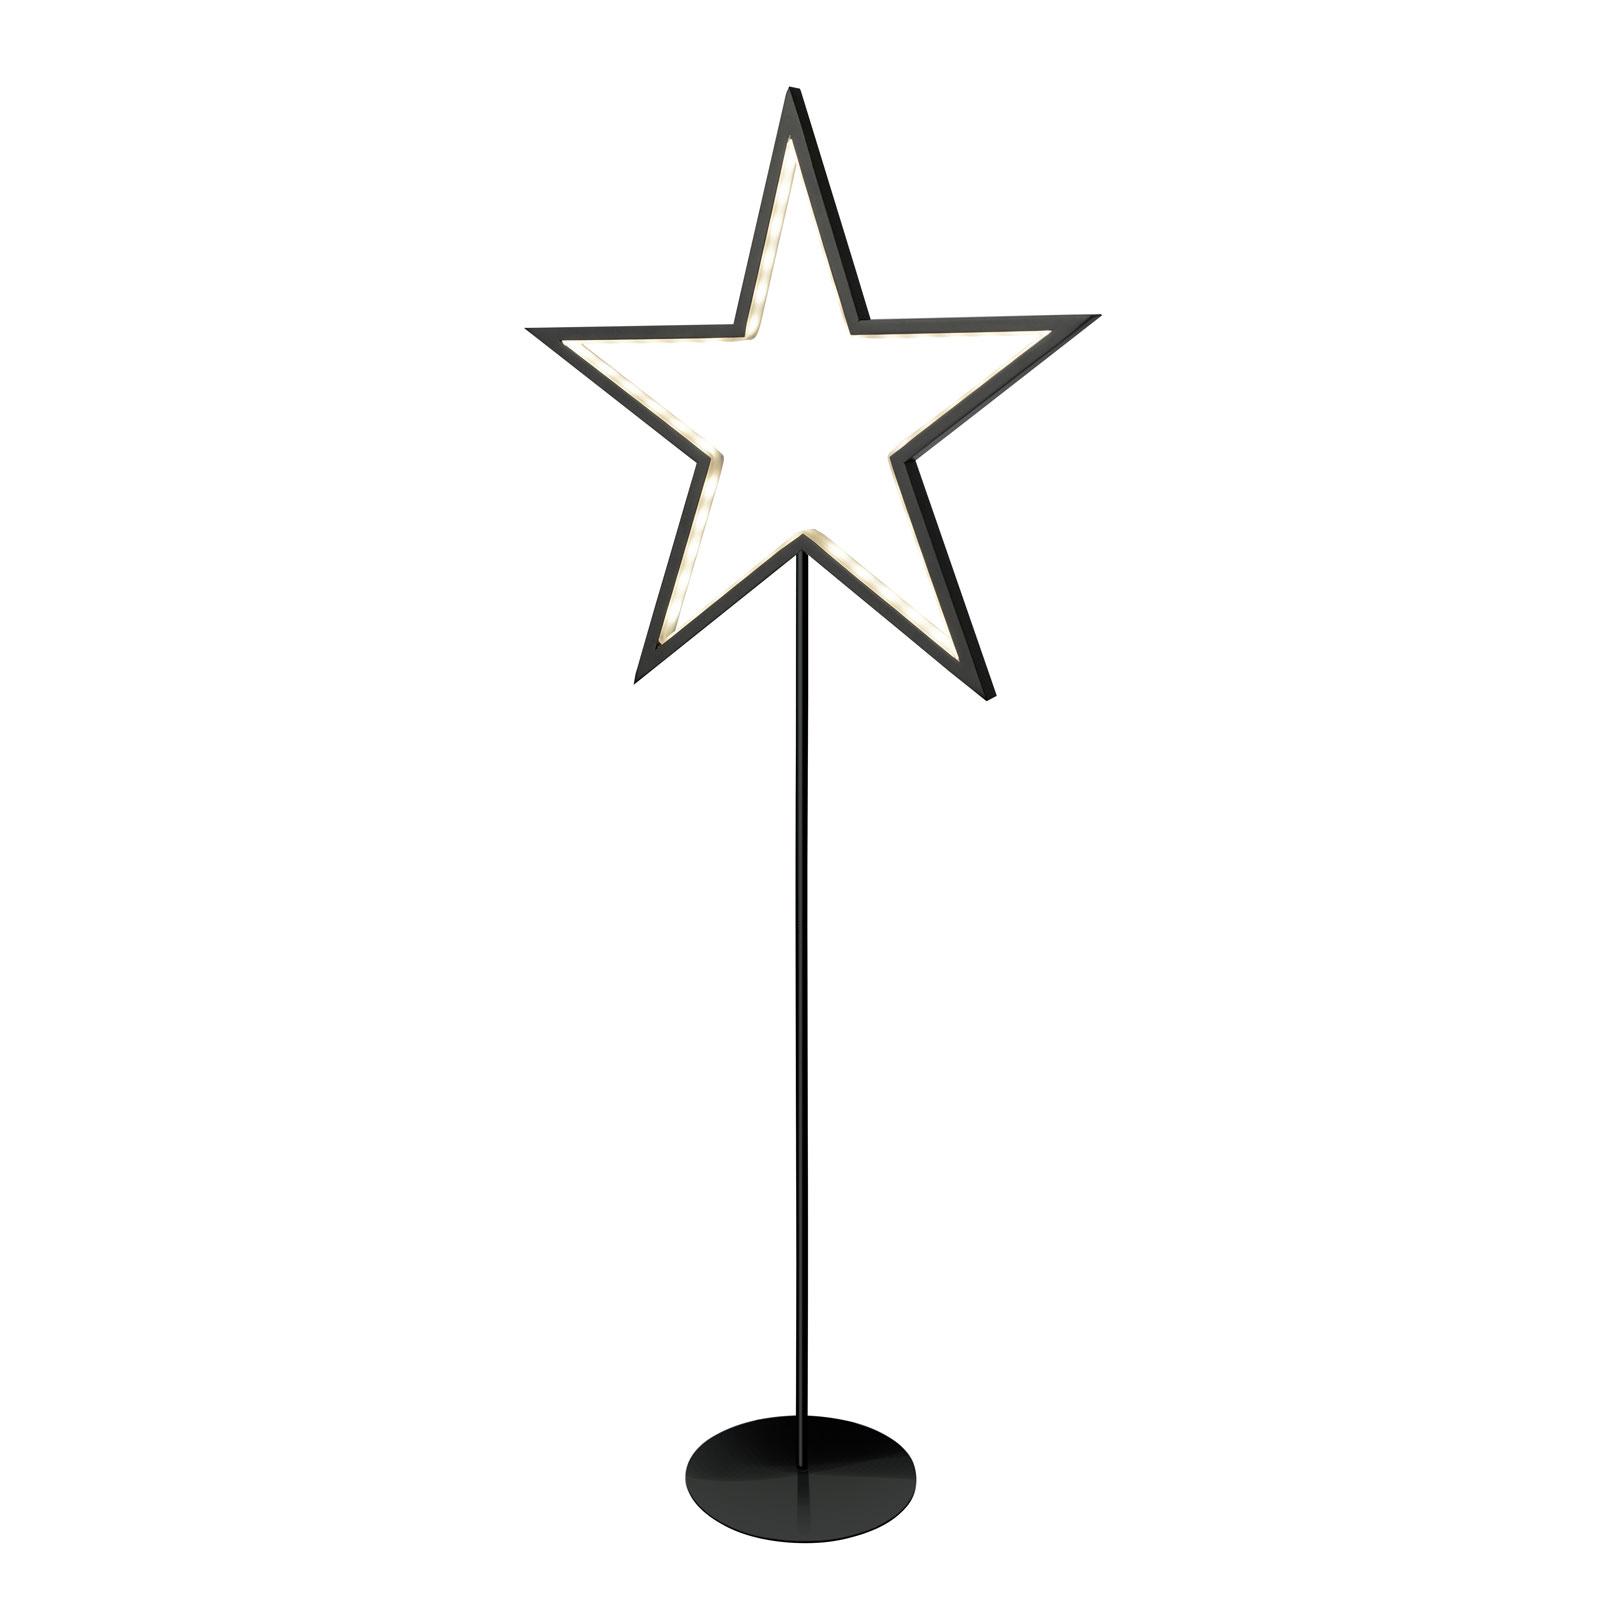 Lucy star decorative light, black, height 100 cm